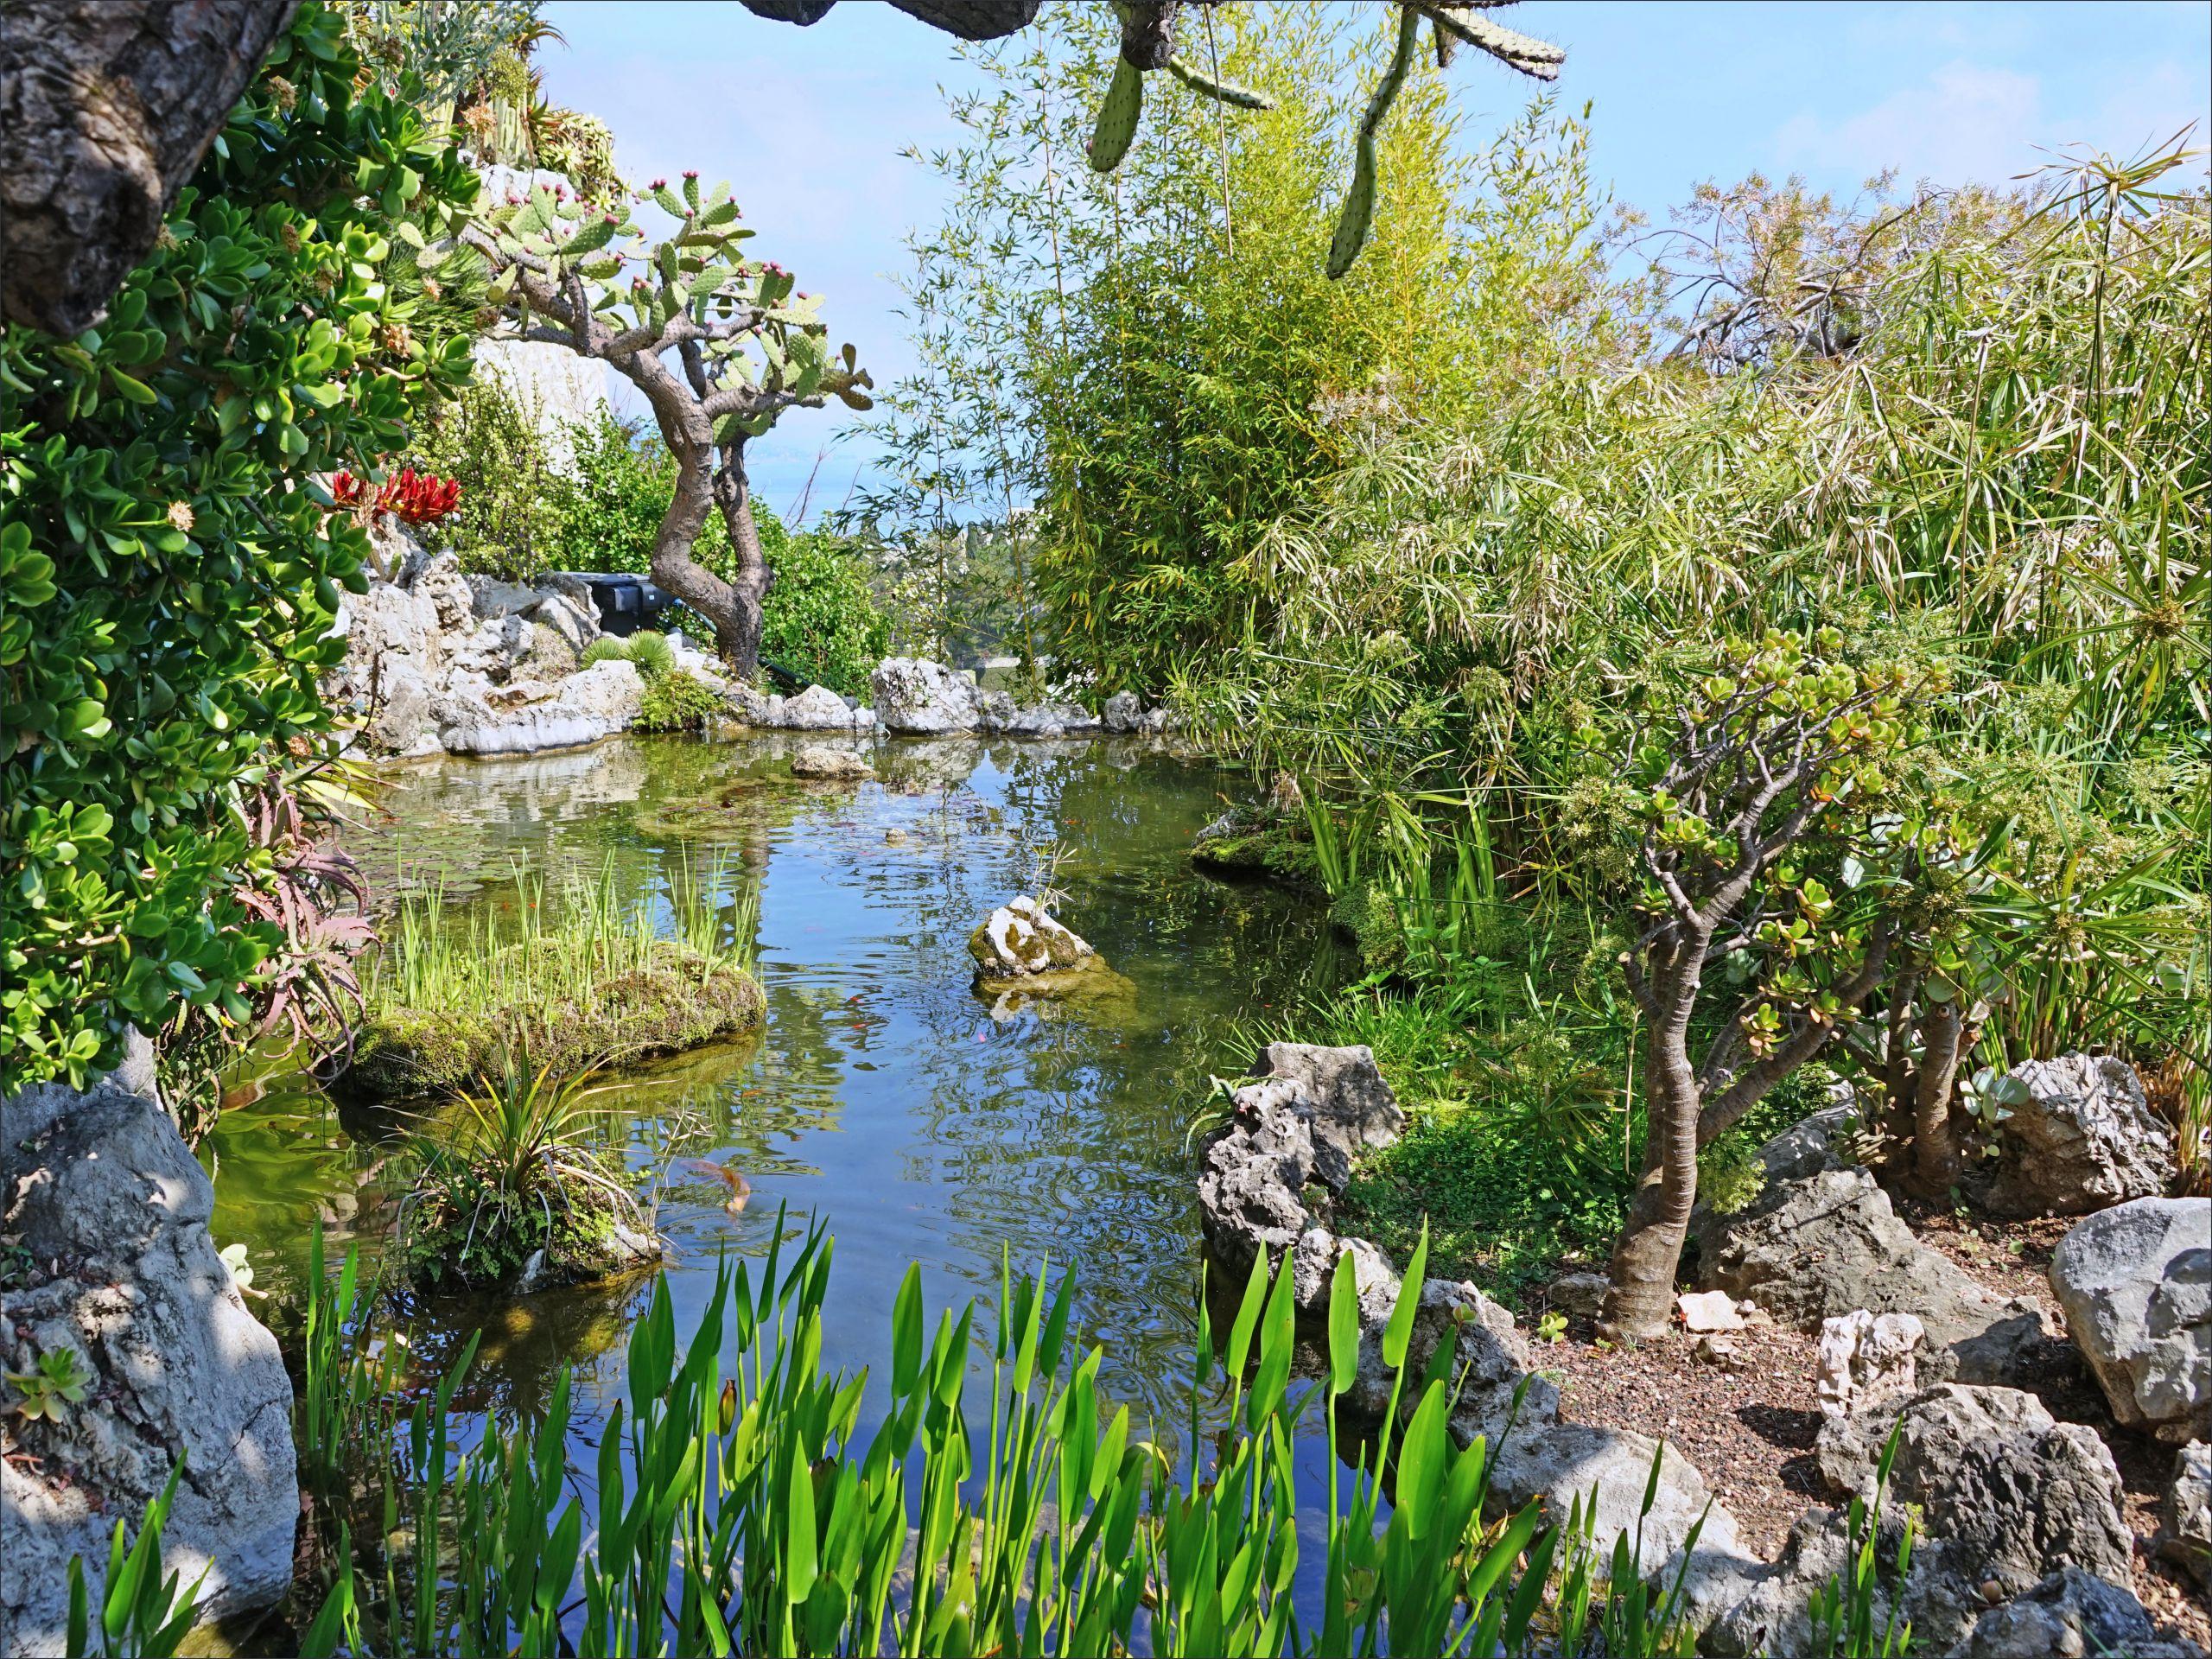 Le jardin exotique de Monaco %